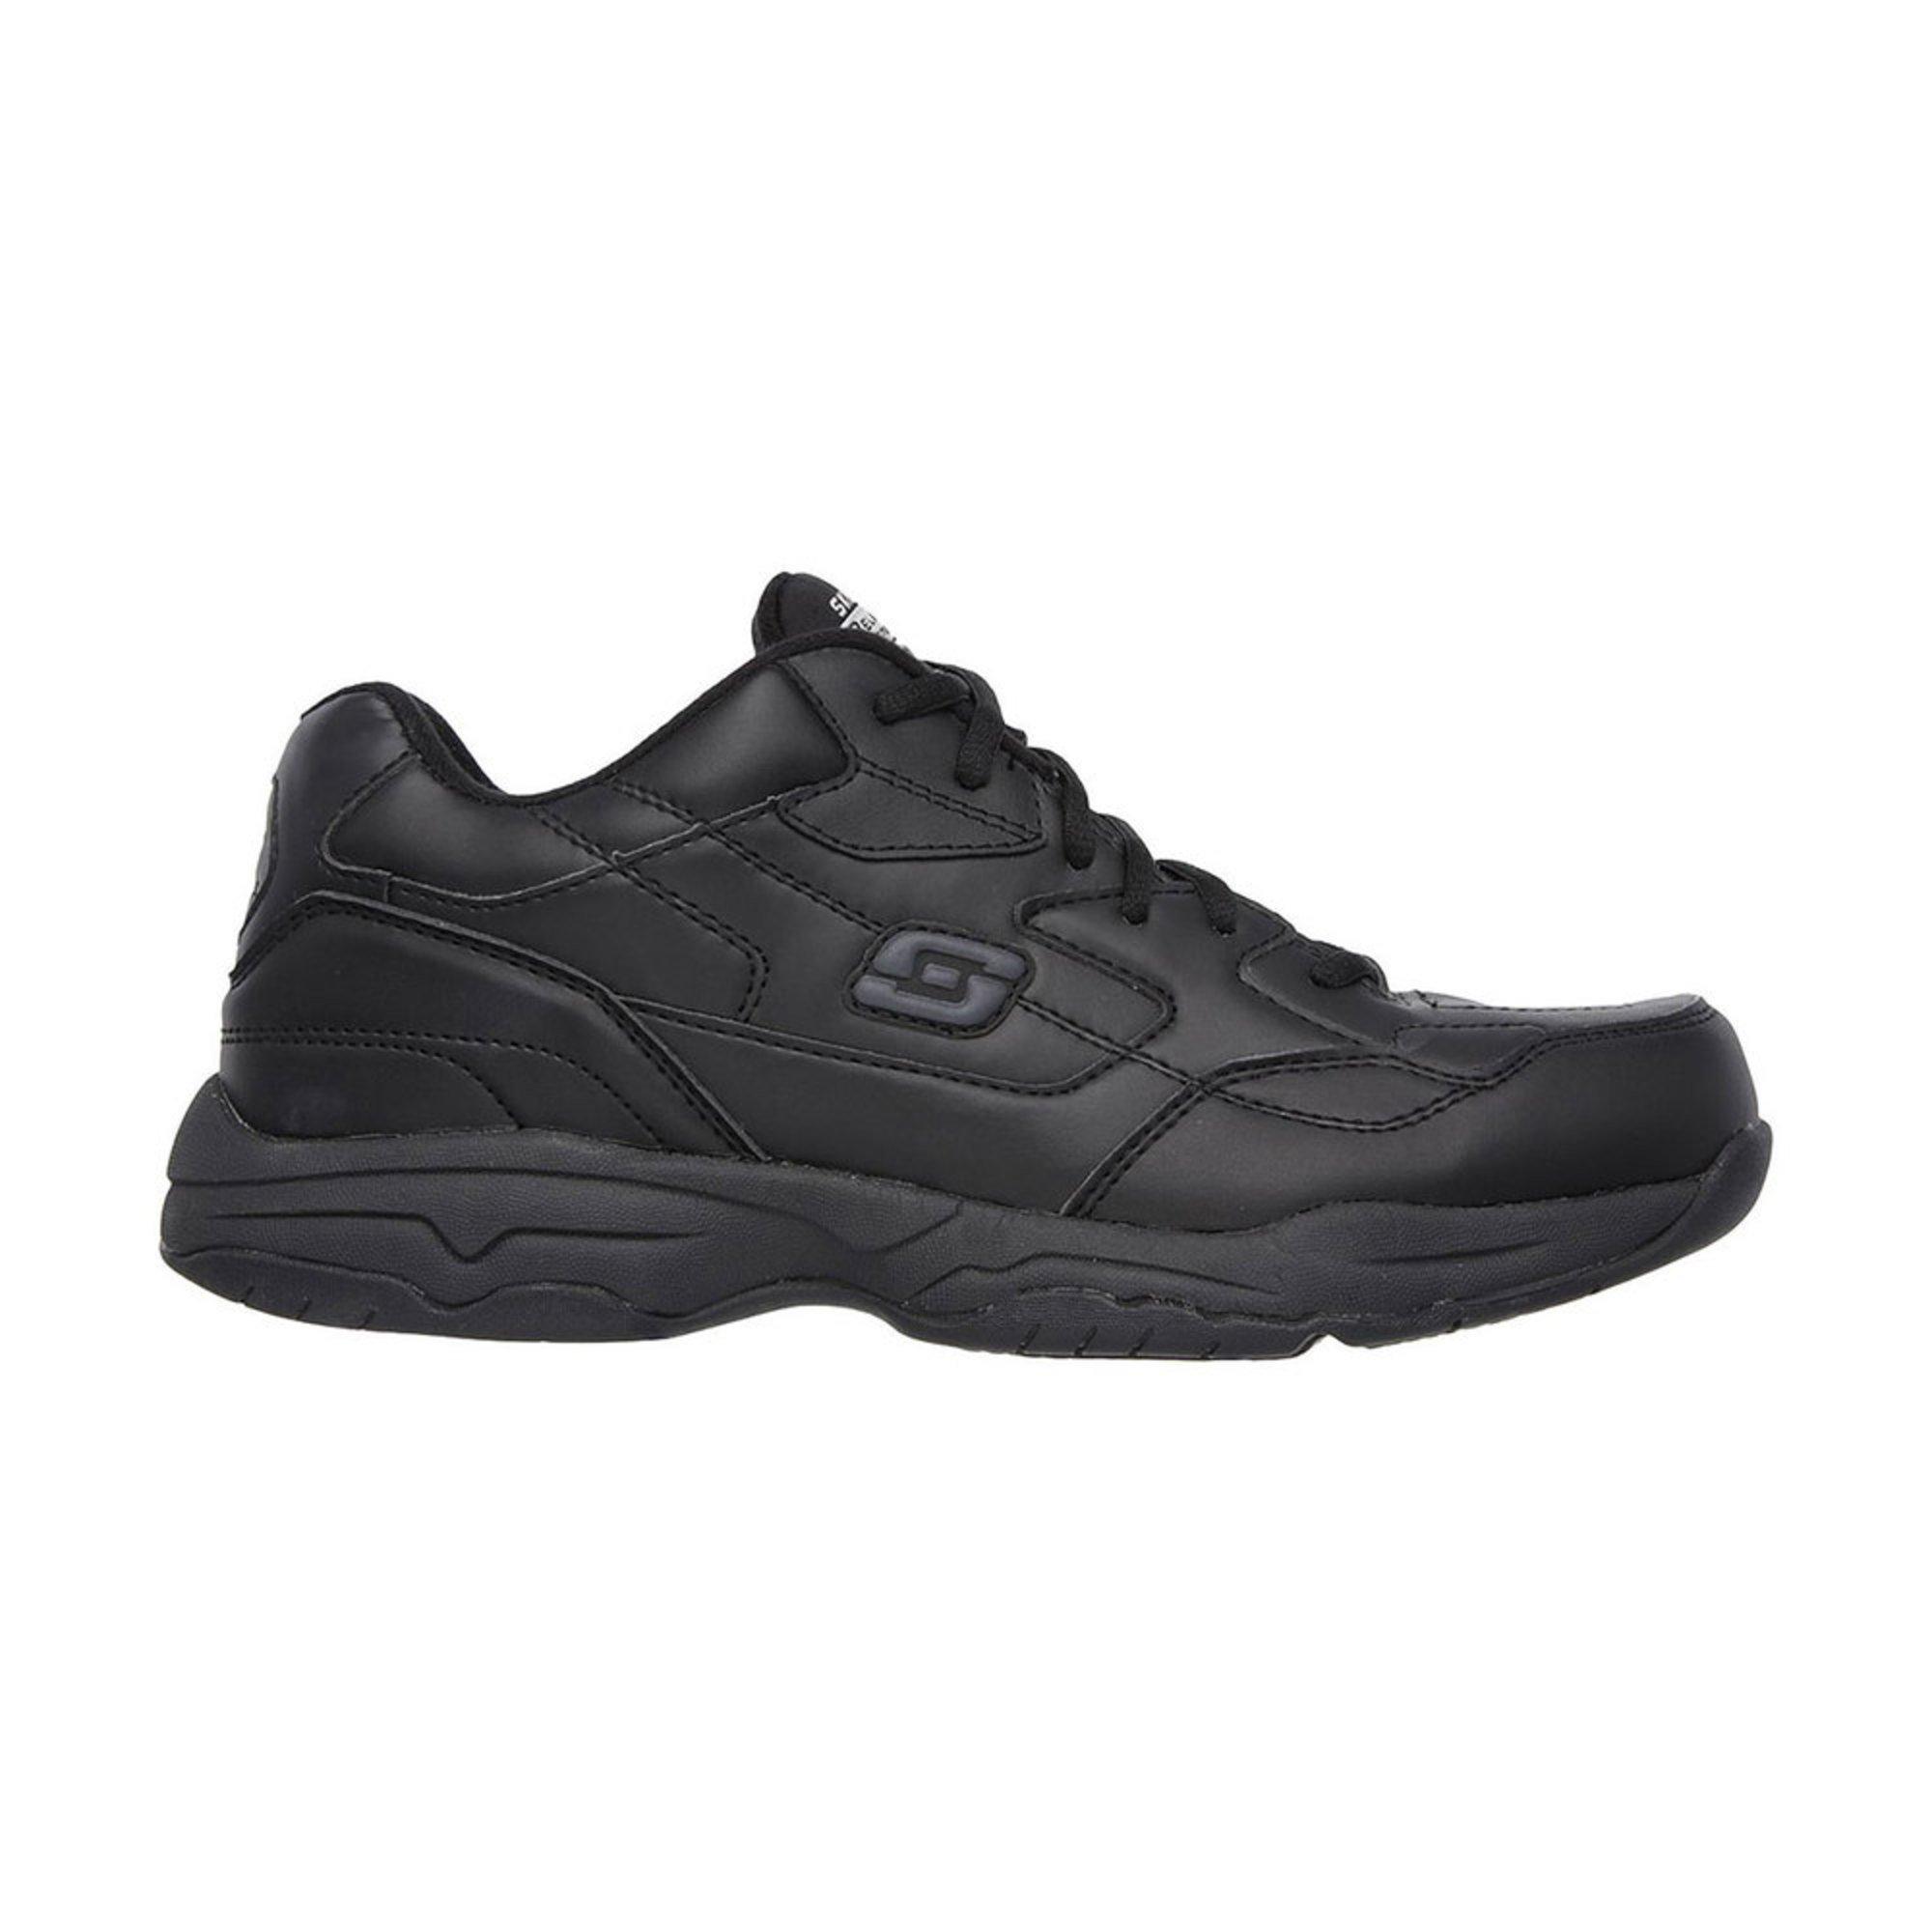 best service 83feb c0c99 Skechers. Skechers Men s Felton Slip Resistant Sneaker